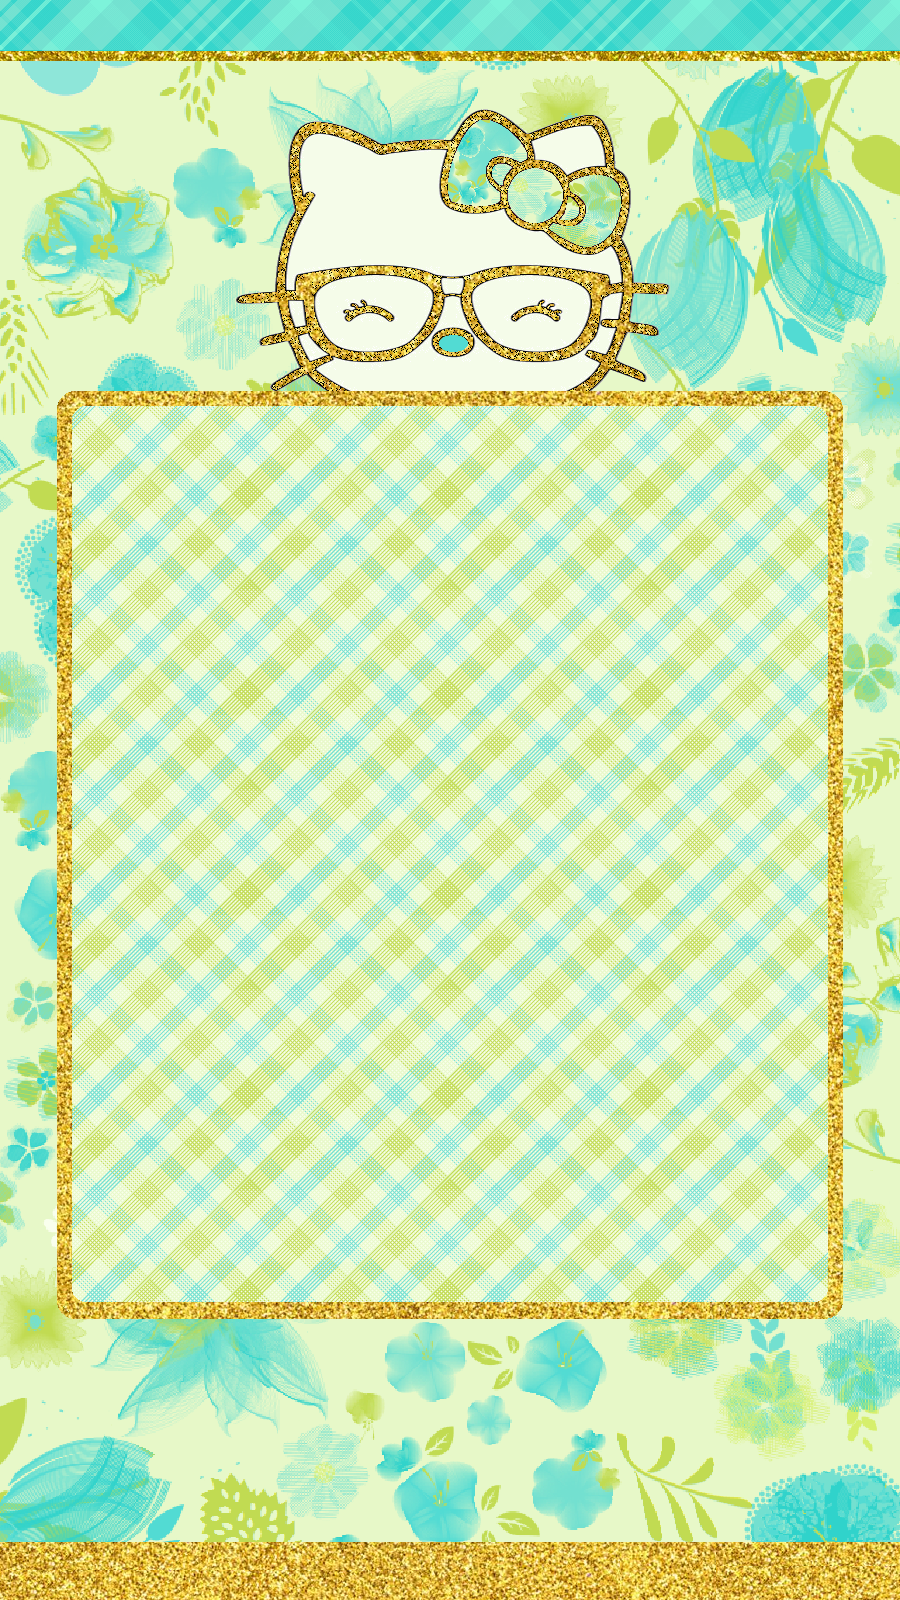 LoveNote 5 Tjn Hello Kitty WallpaperIphone WallpapersKawaiiBackgrounds NotebooksWallpapersPaperWalpaper KittyKawaii Cute